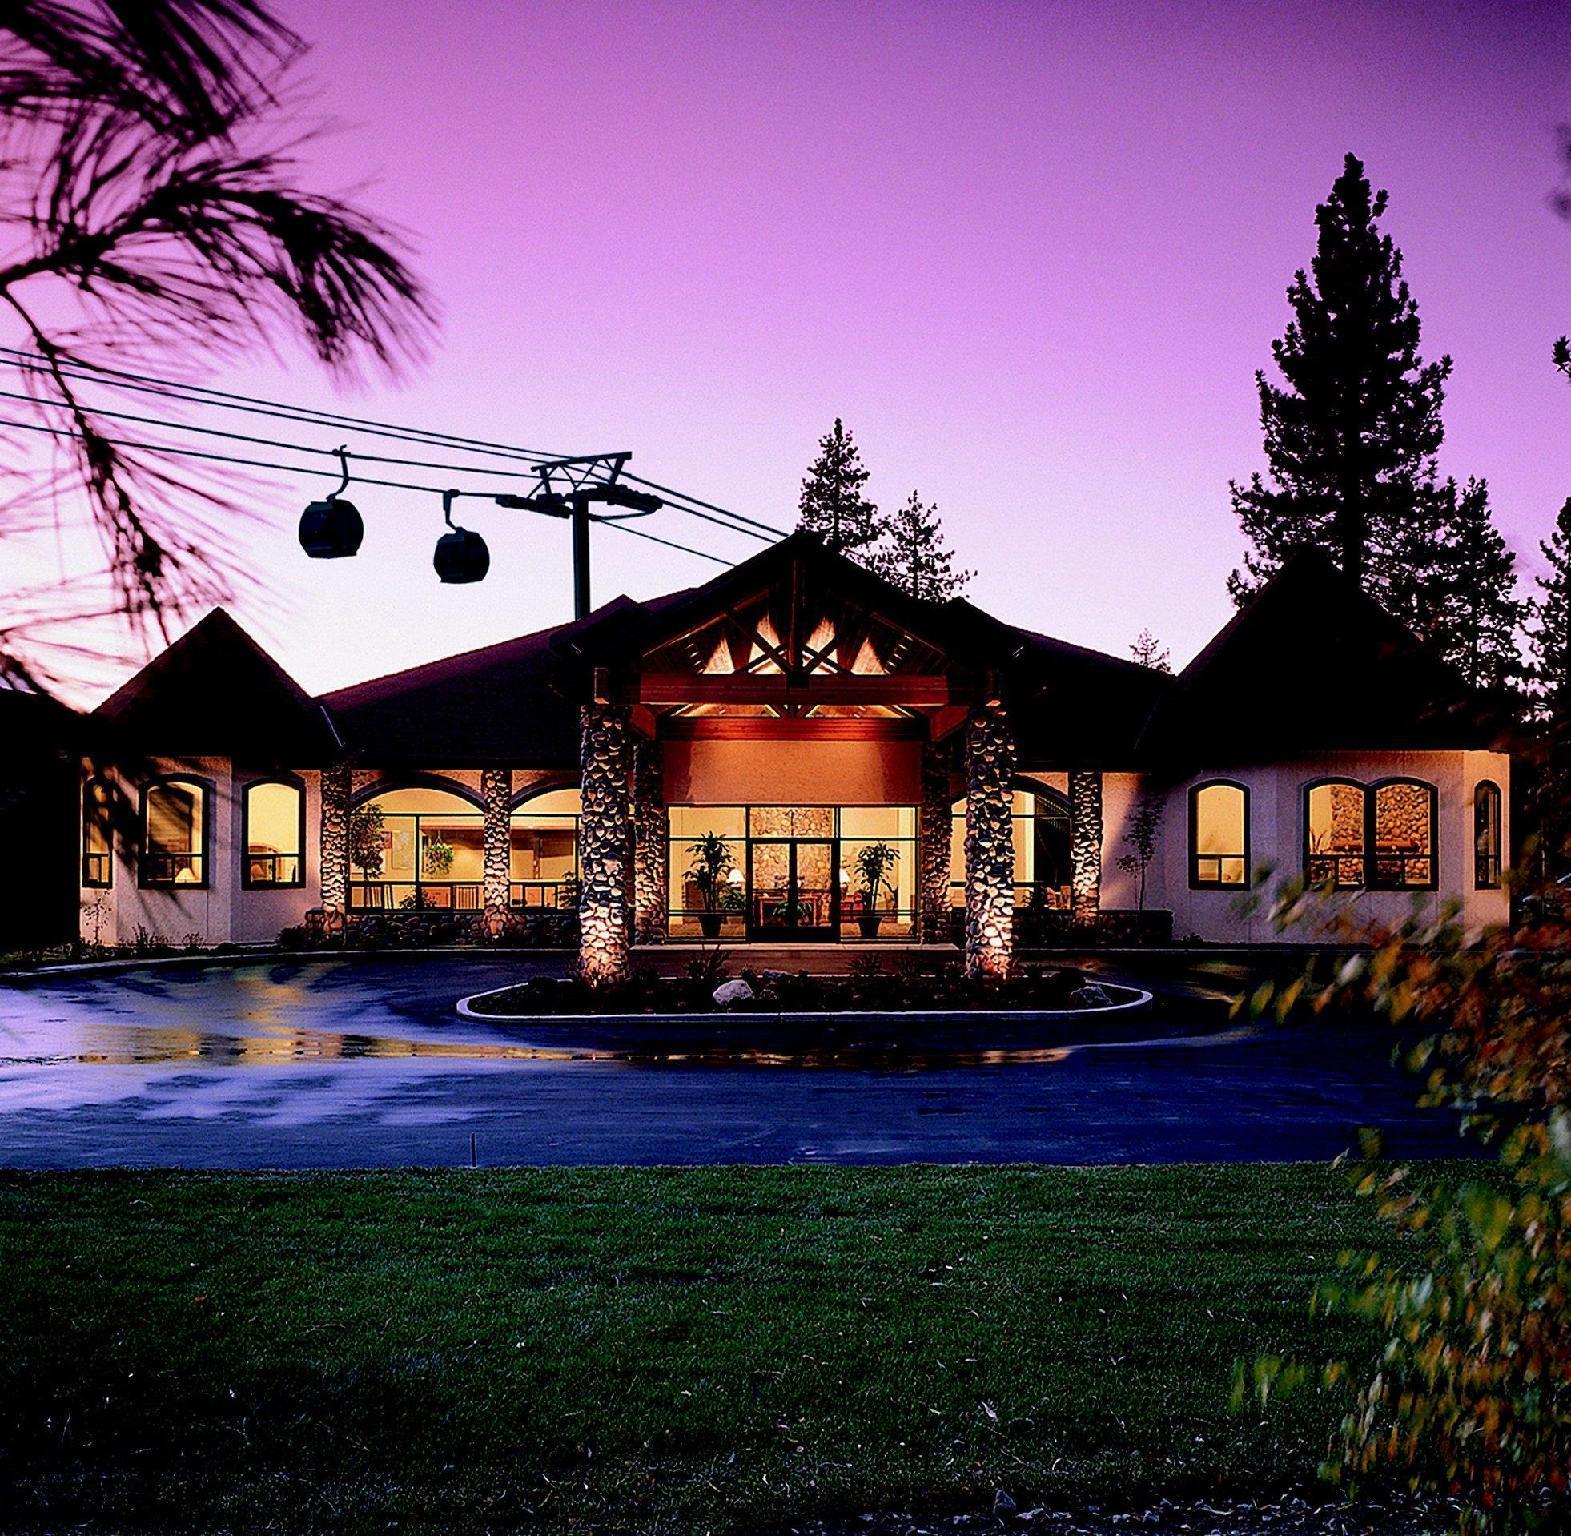 Forest Suites Resort At The Heavenly Village